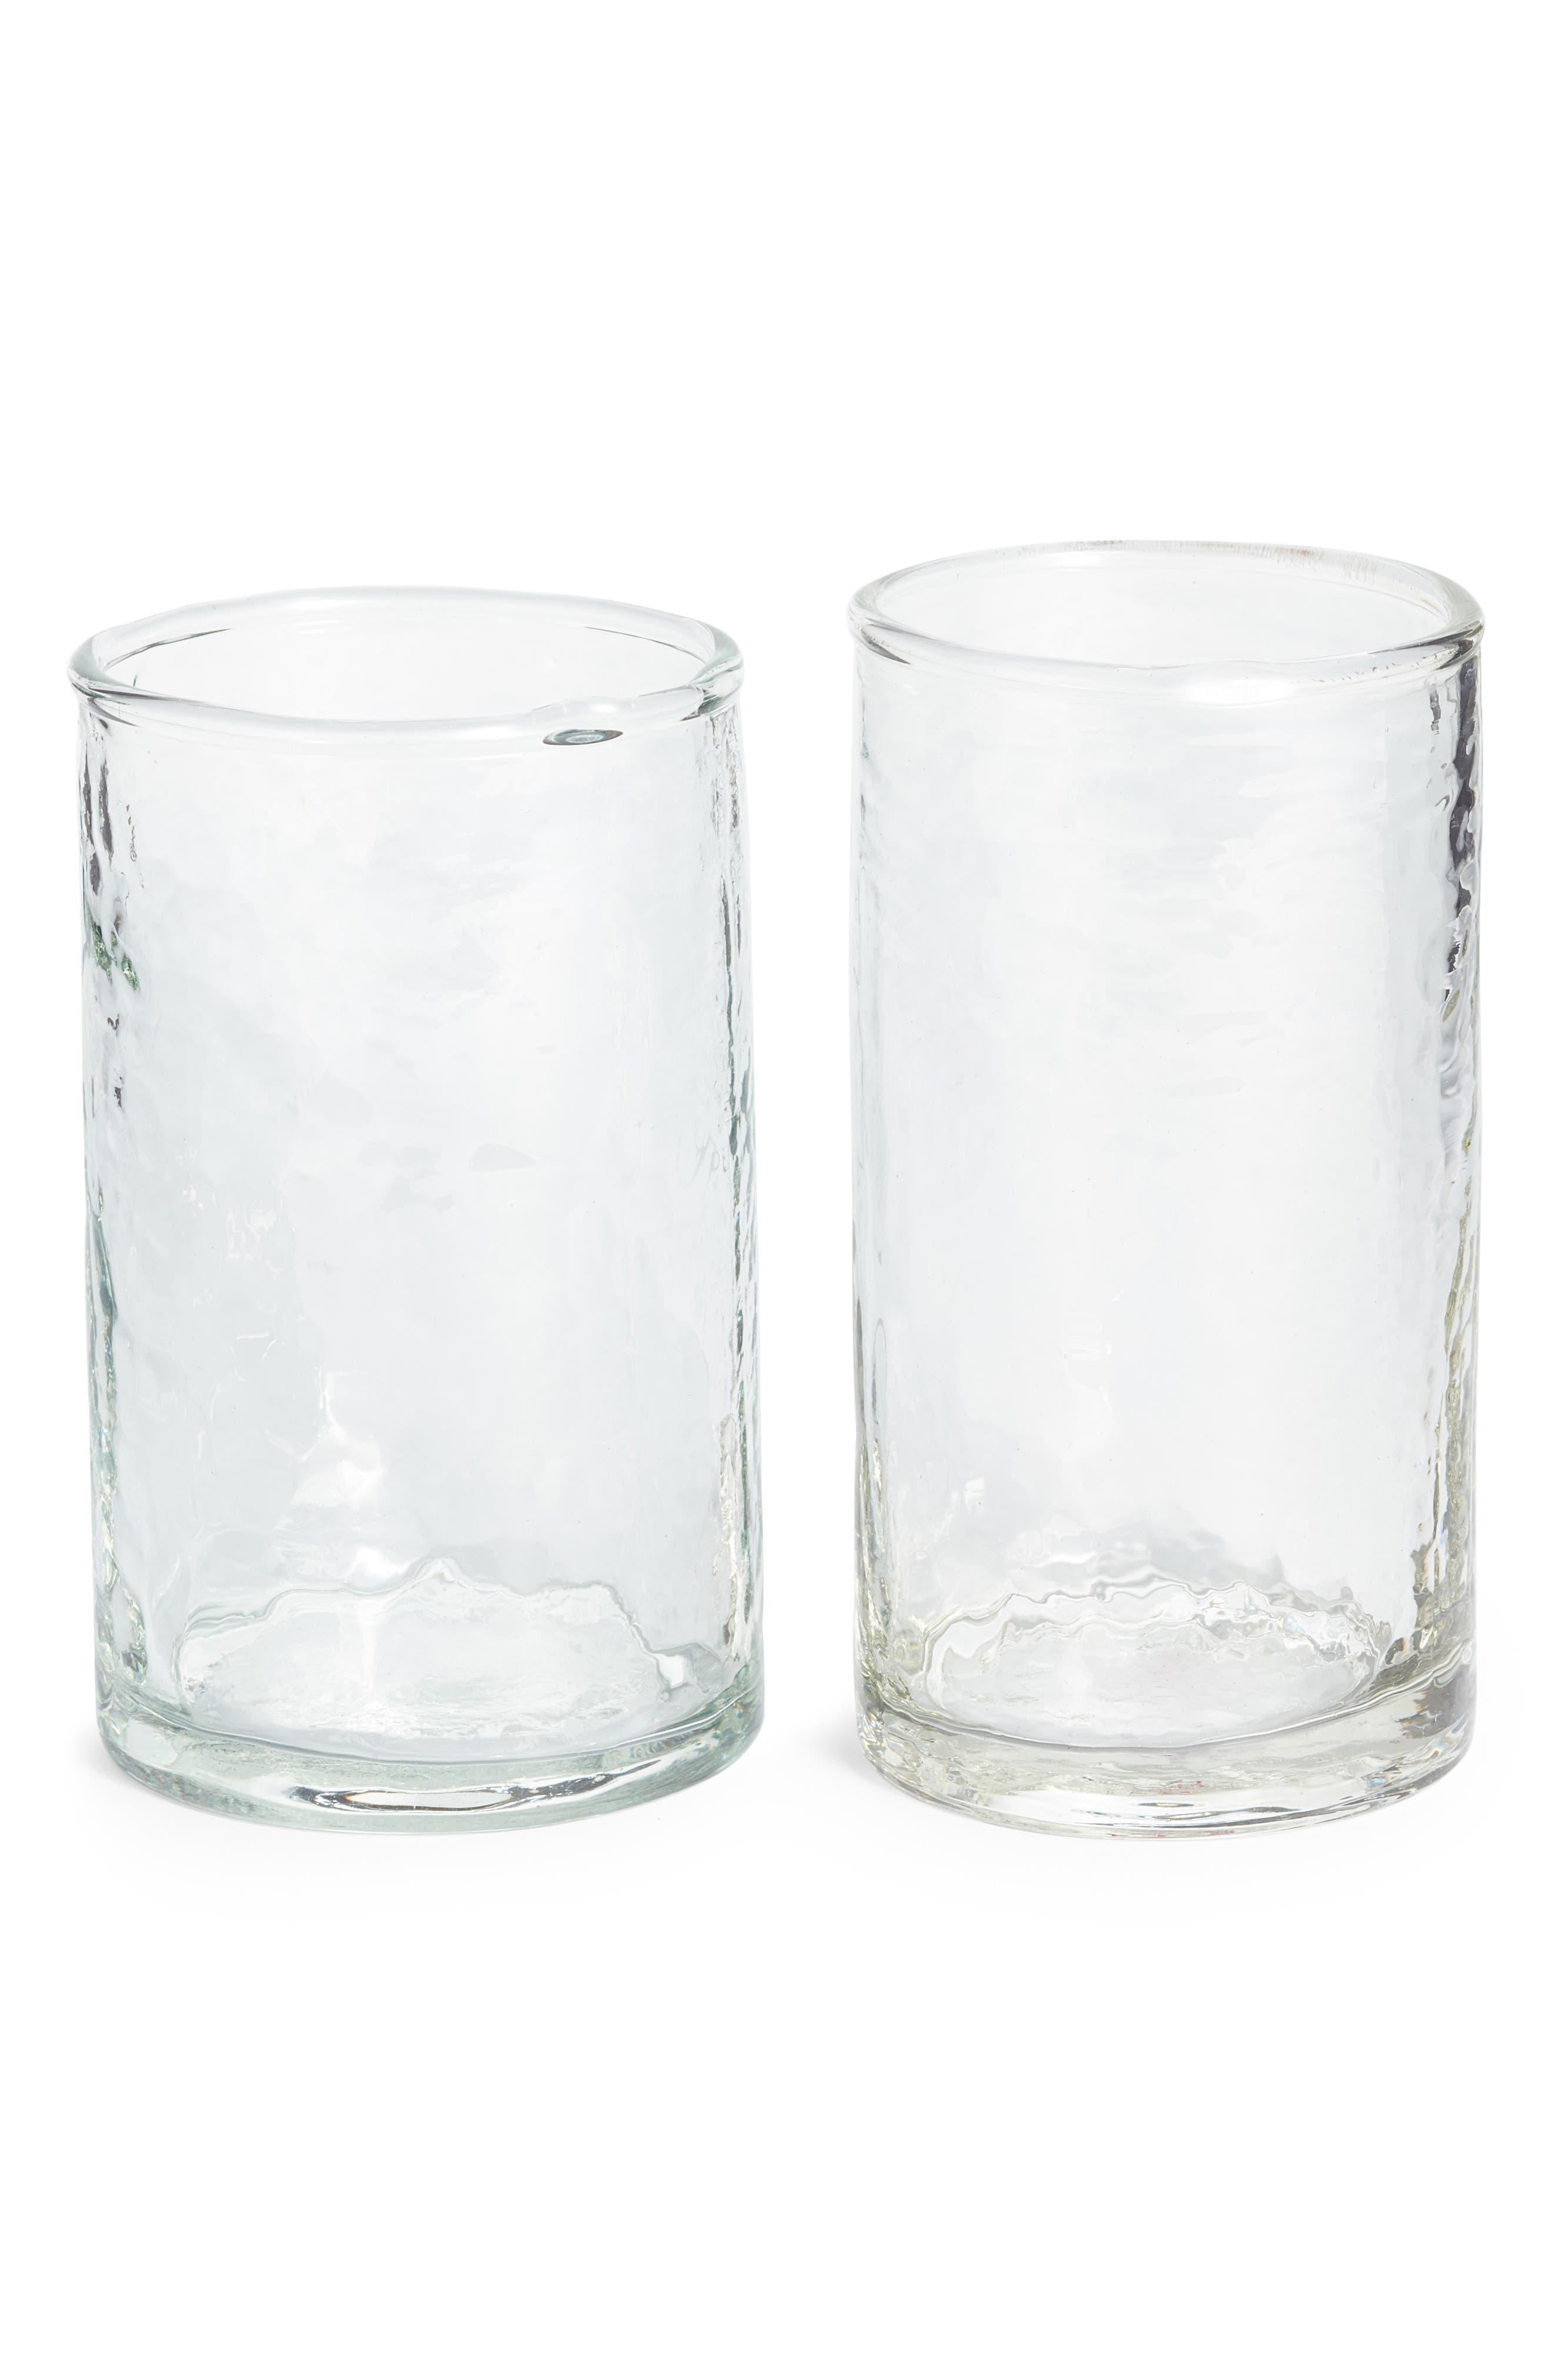 Main Image - Treasure & Bond Set of Two Hammered Short Glasses